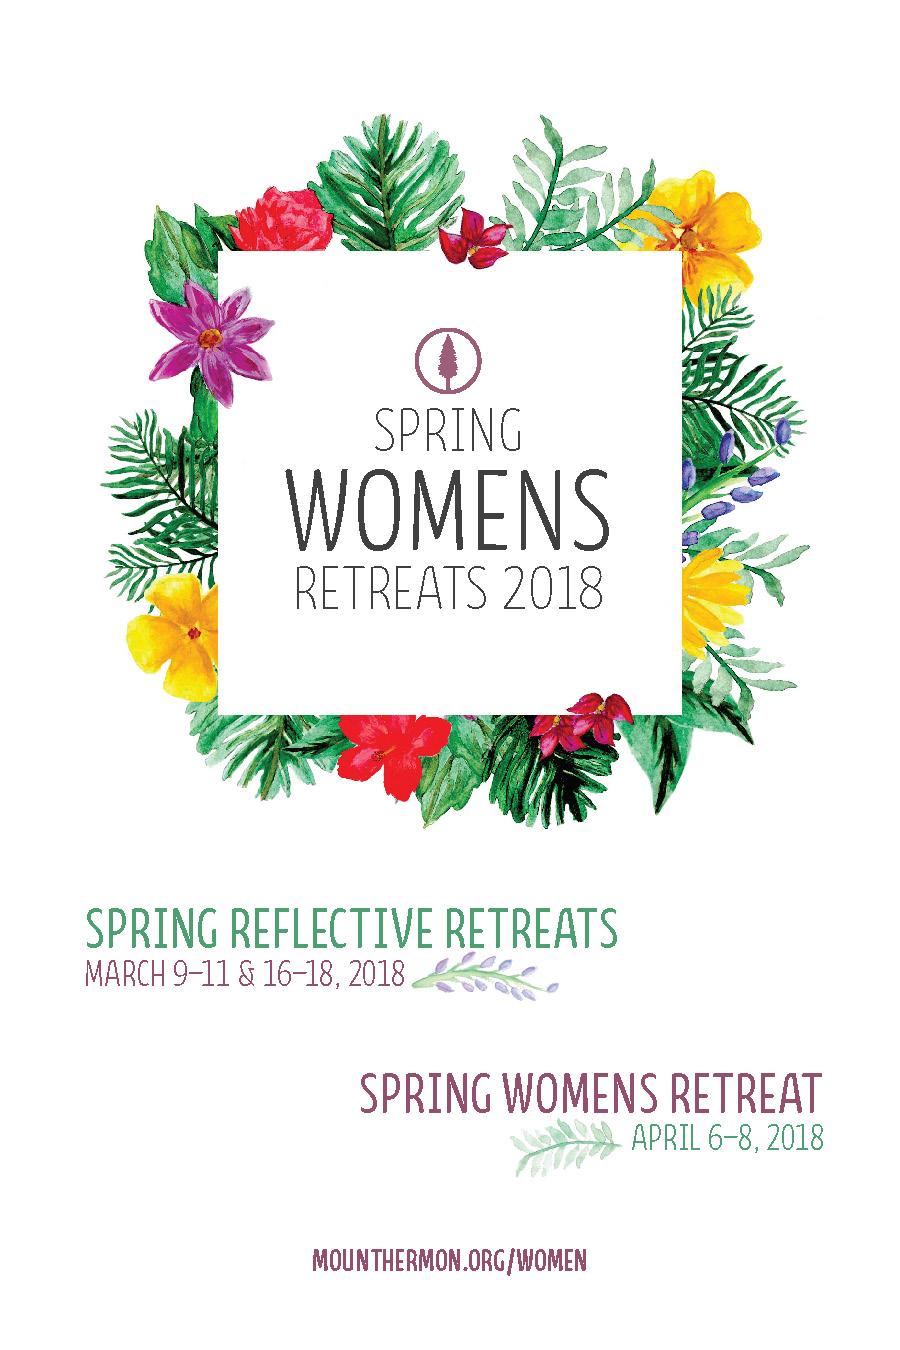 Spring 2018 Women's Retreats Poster